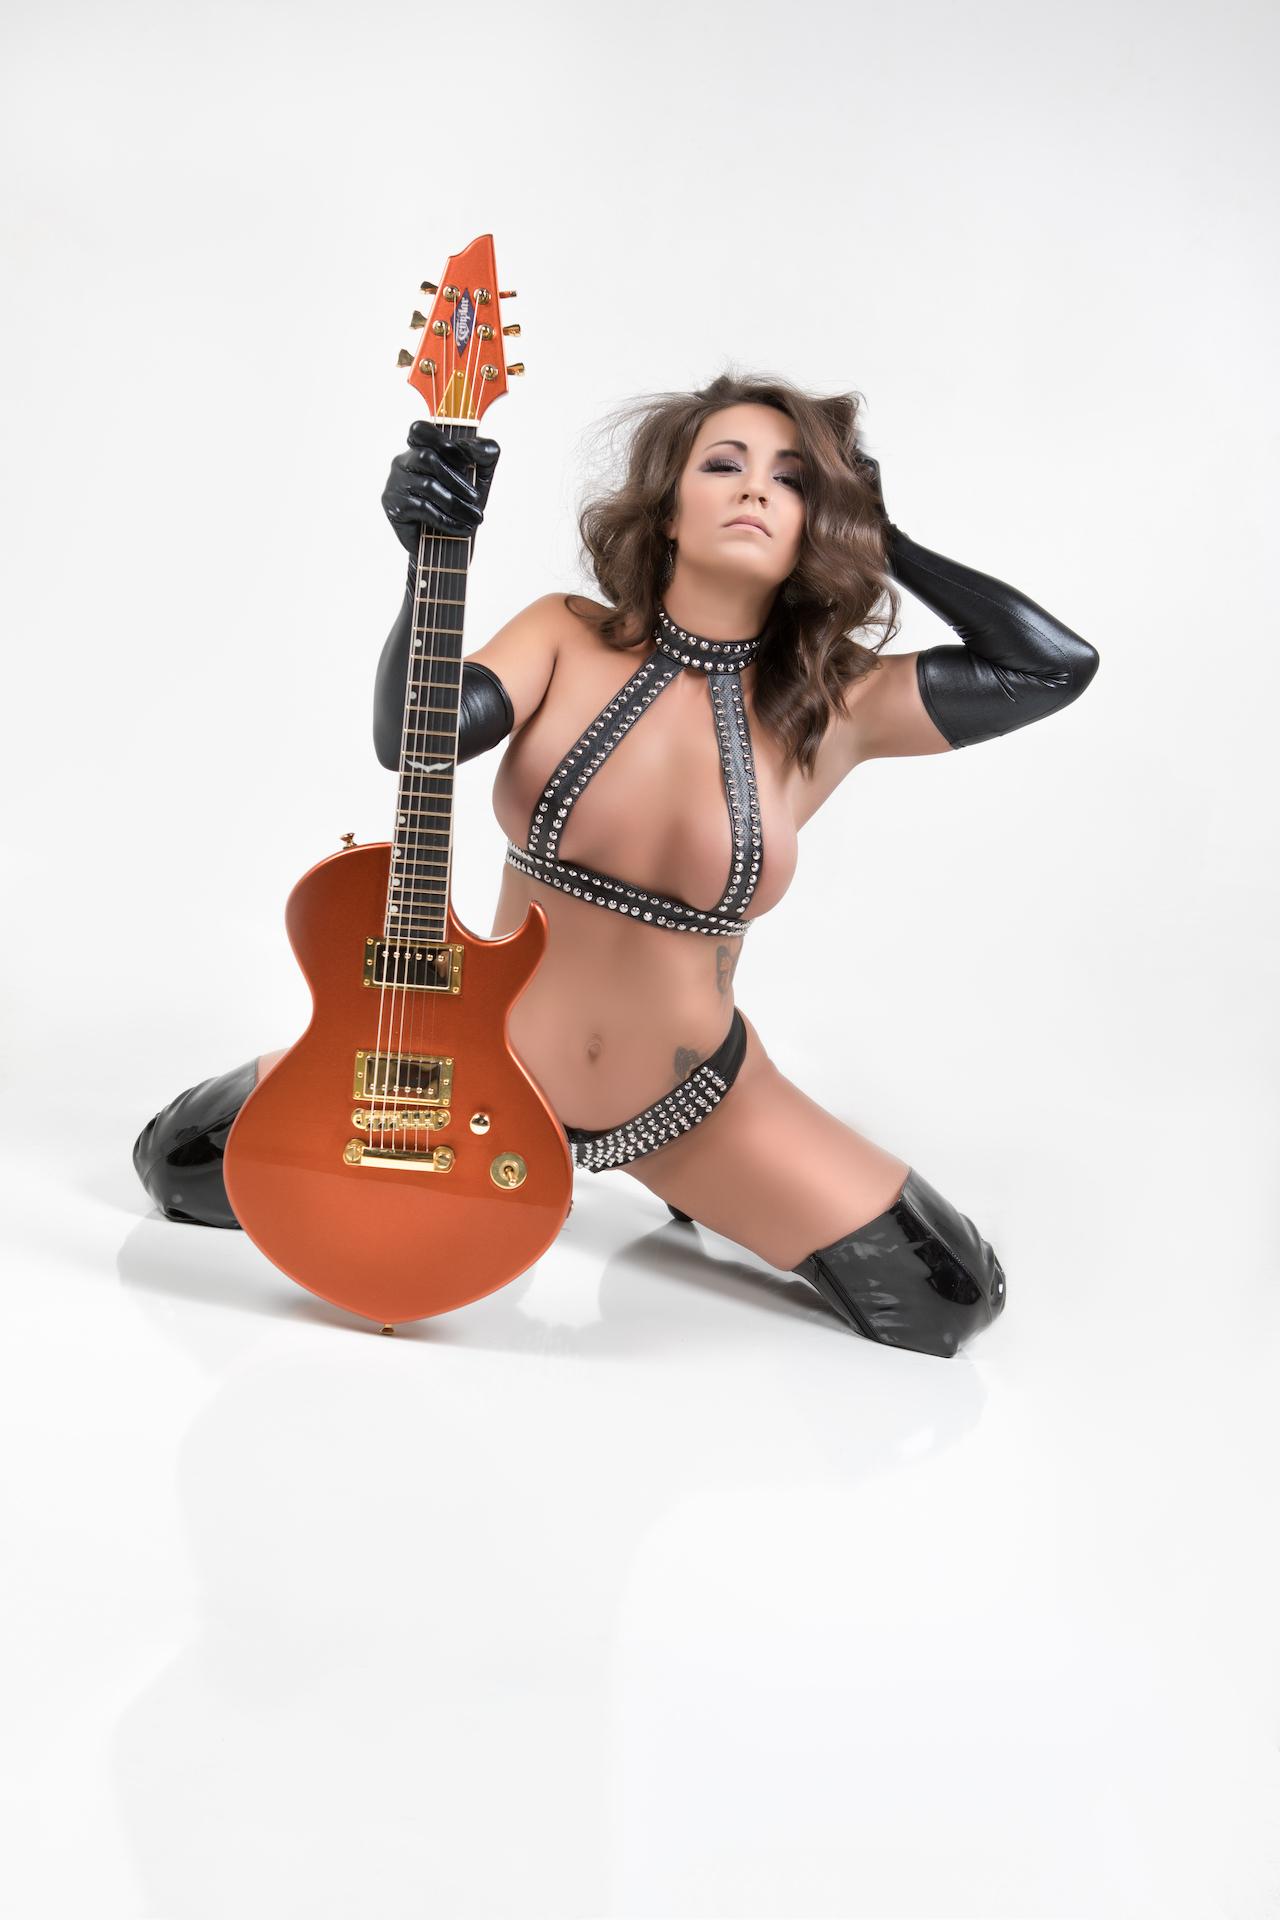 Guitar1017Courtney - IMGL9041-Edit.jpg